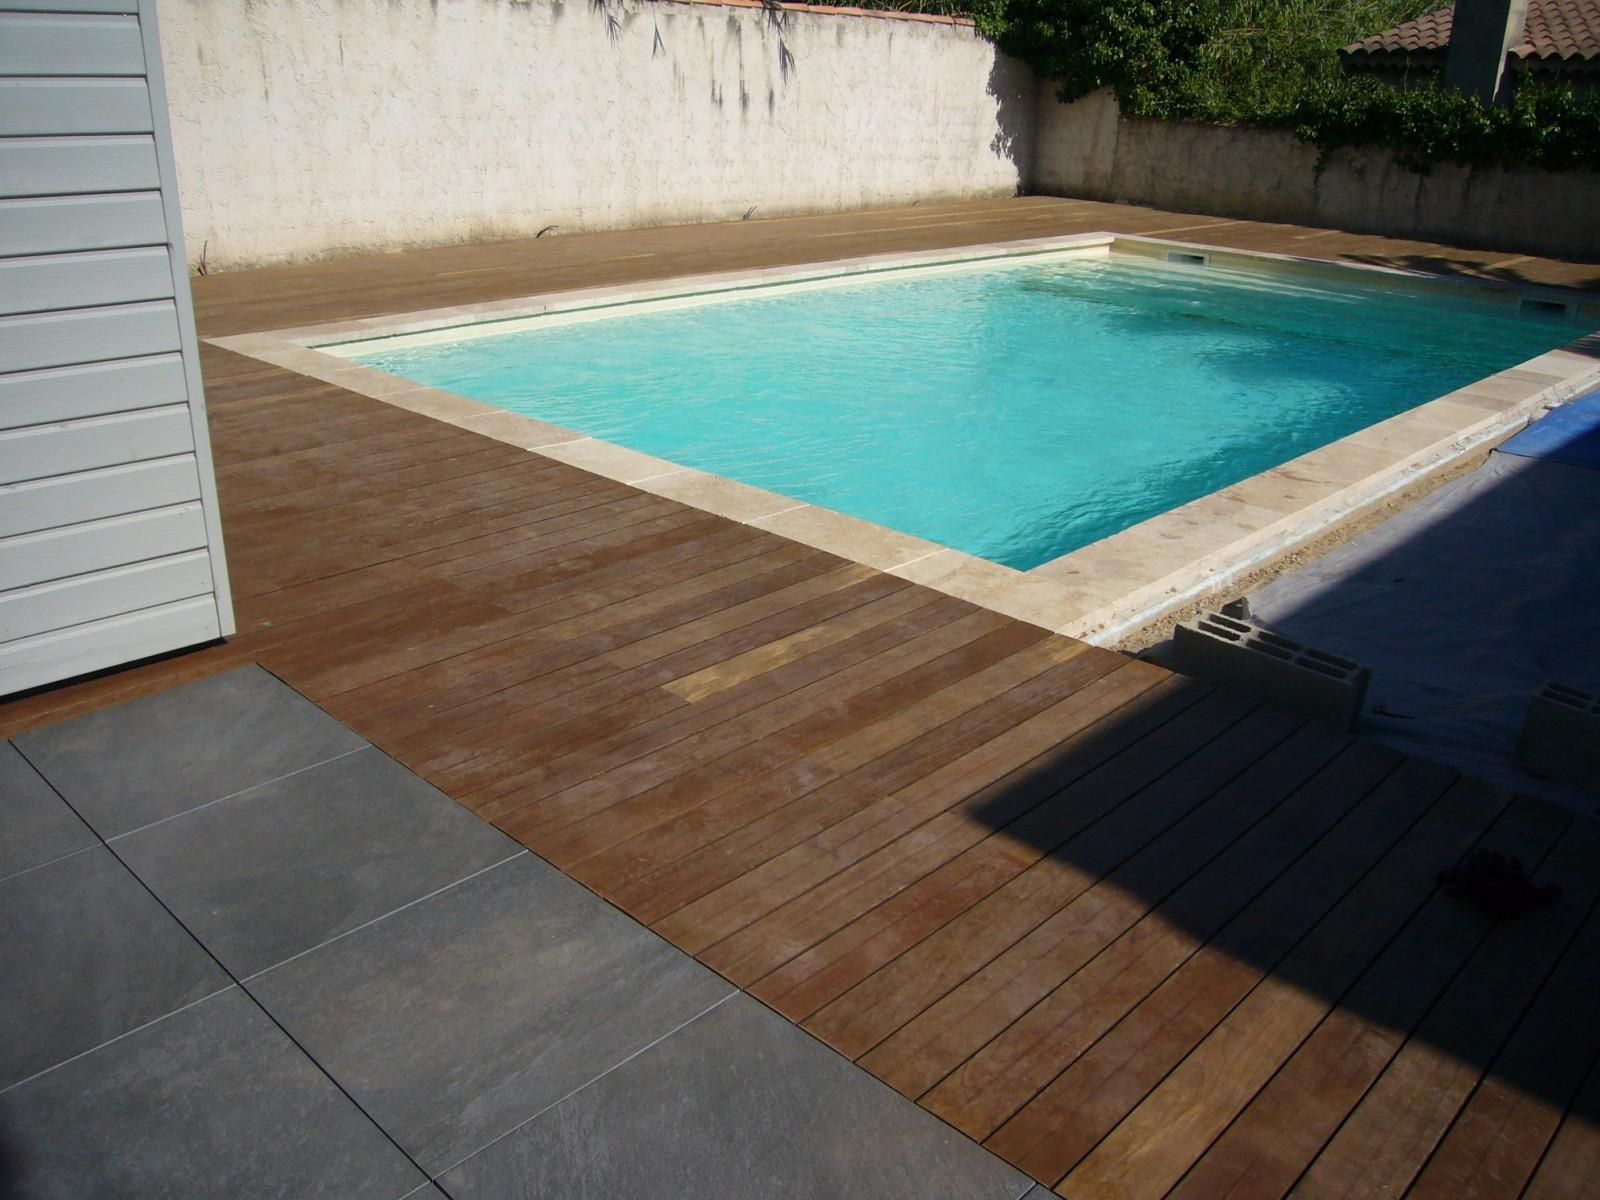 keramik stein holz terrasse bs holzdesign. Black Bedroom Furniture Sets. Home Design Ideas